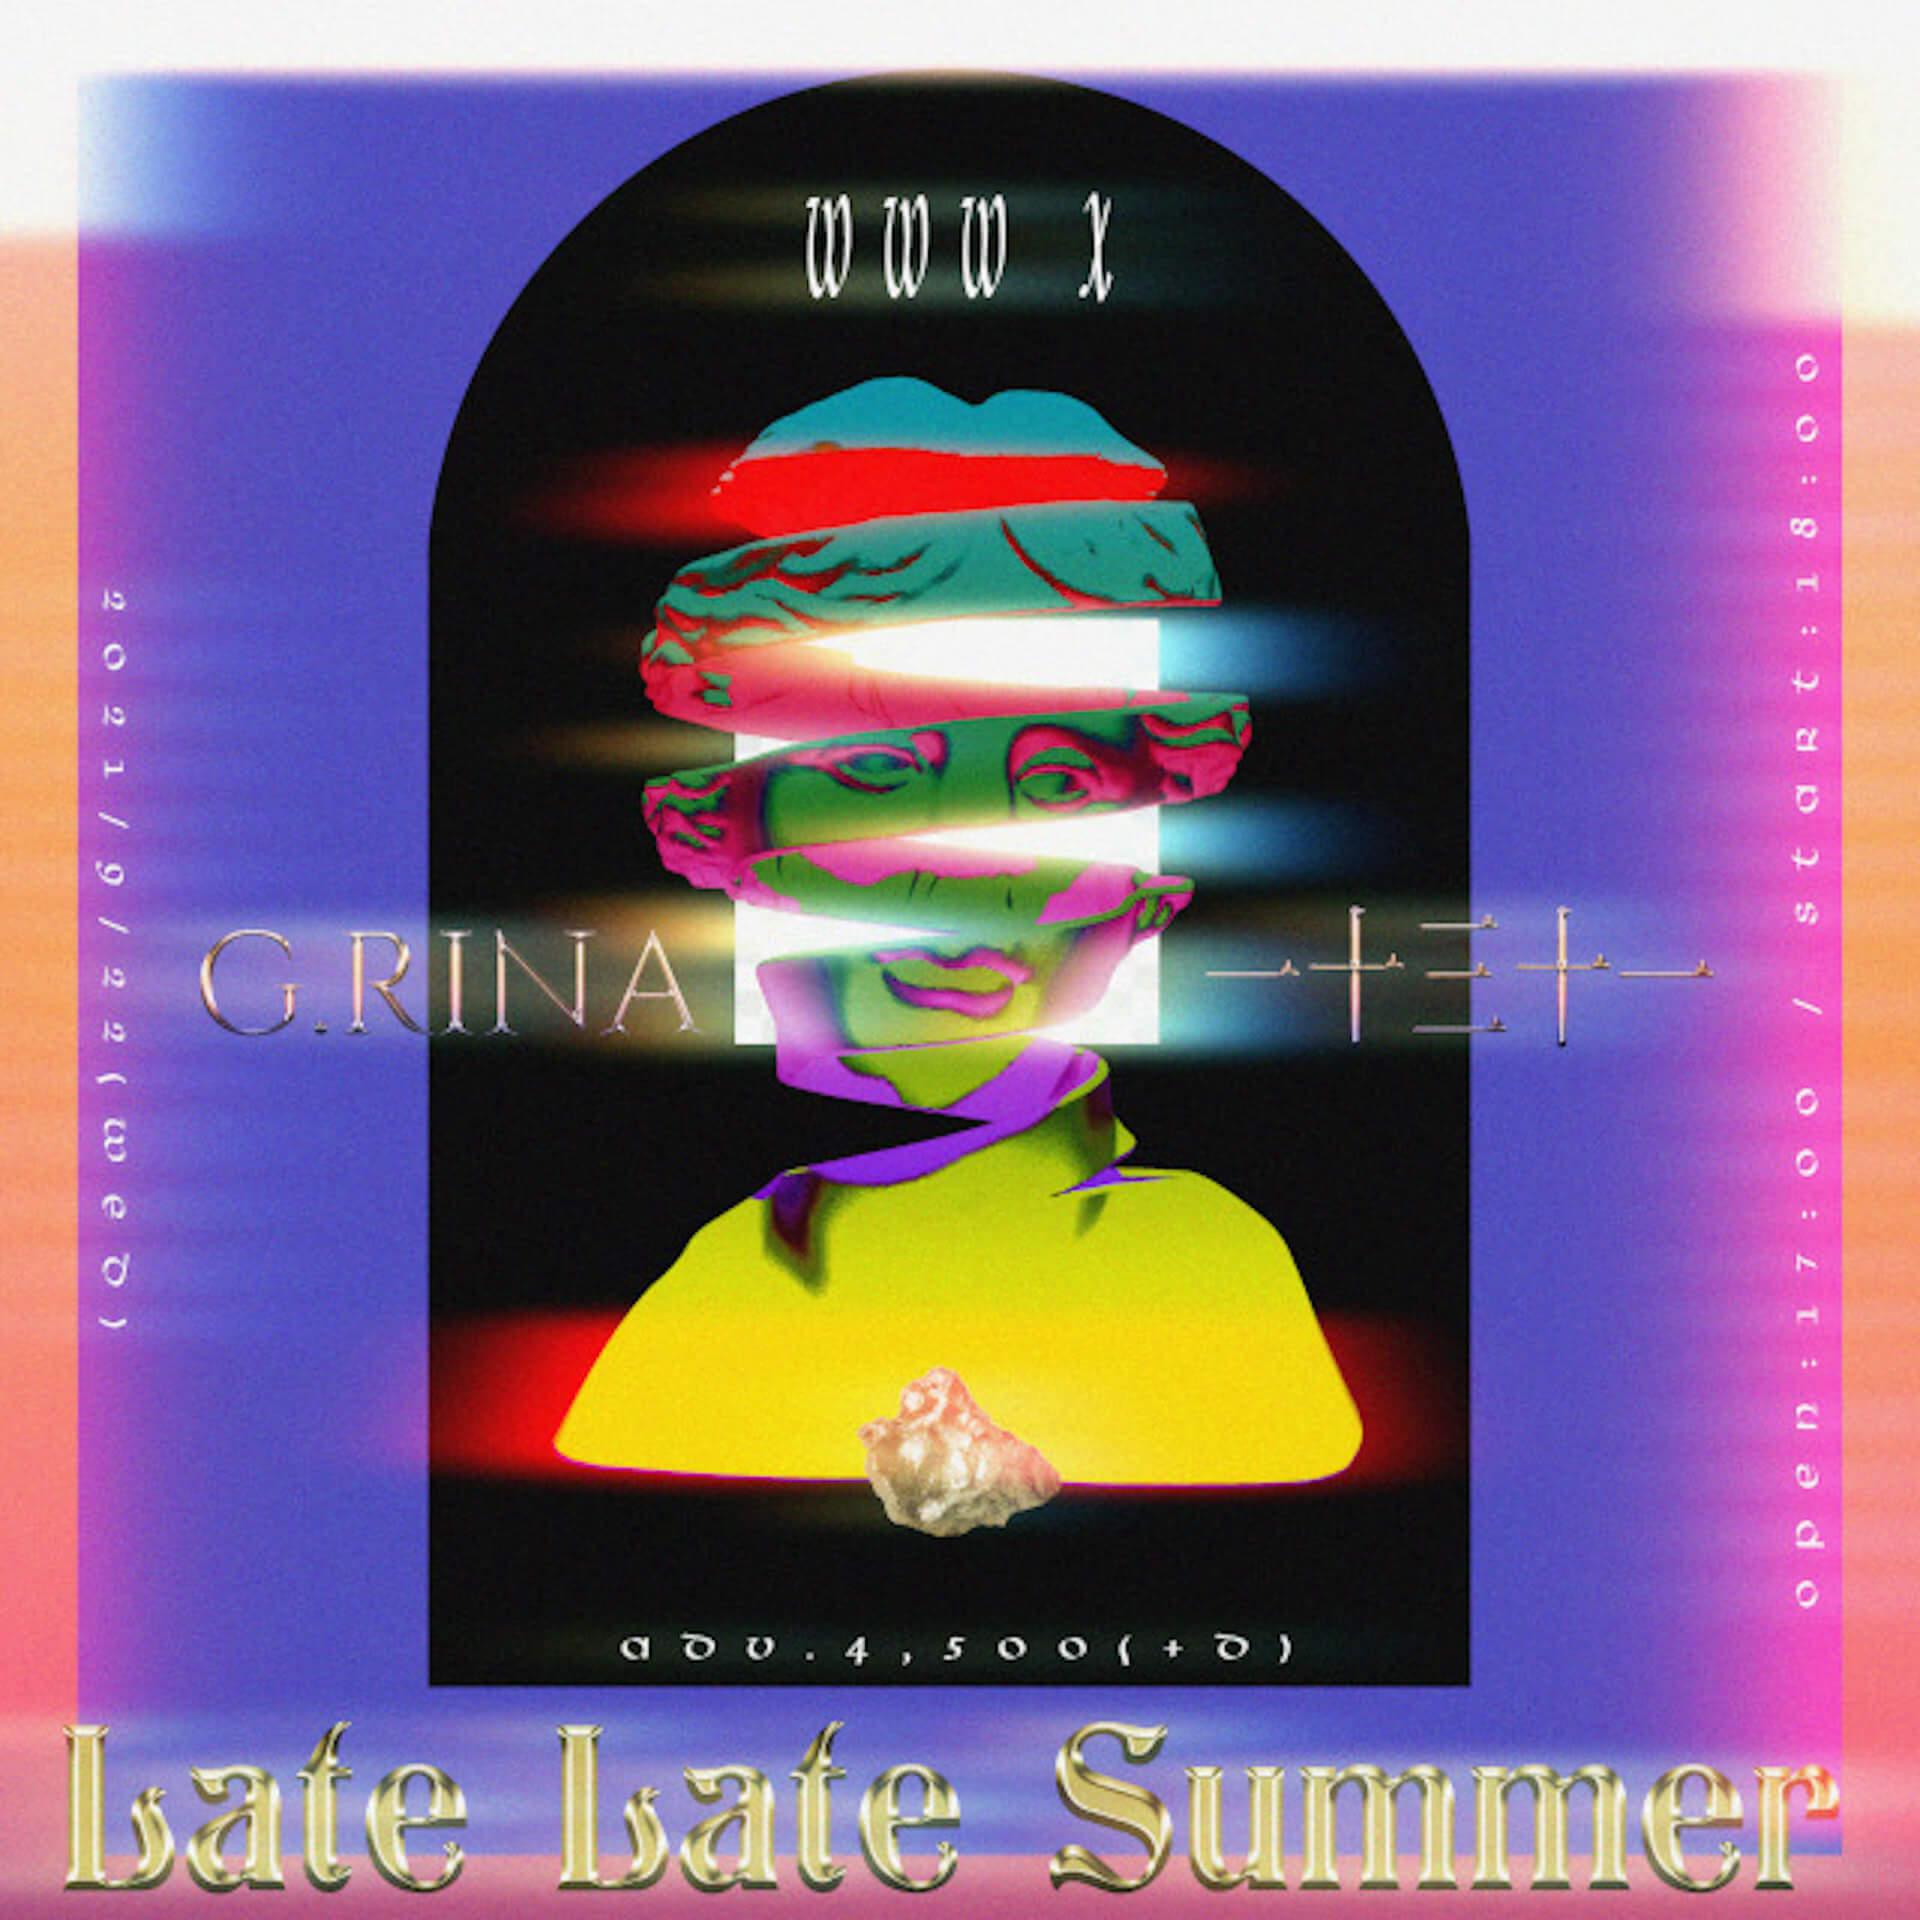 G.RINAと一十三十一が初共演を飾る<Late Late Summer>をWWW Xにて開催決定! music210816_grina-hitomitoi_1